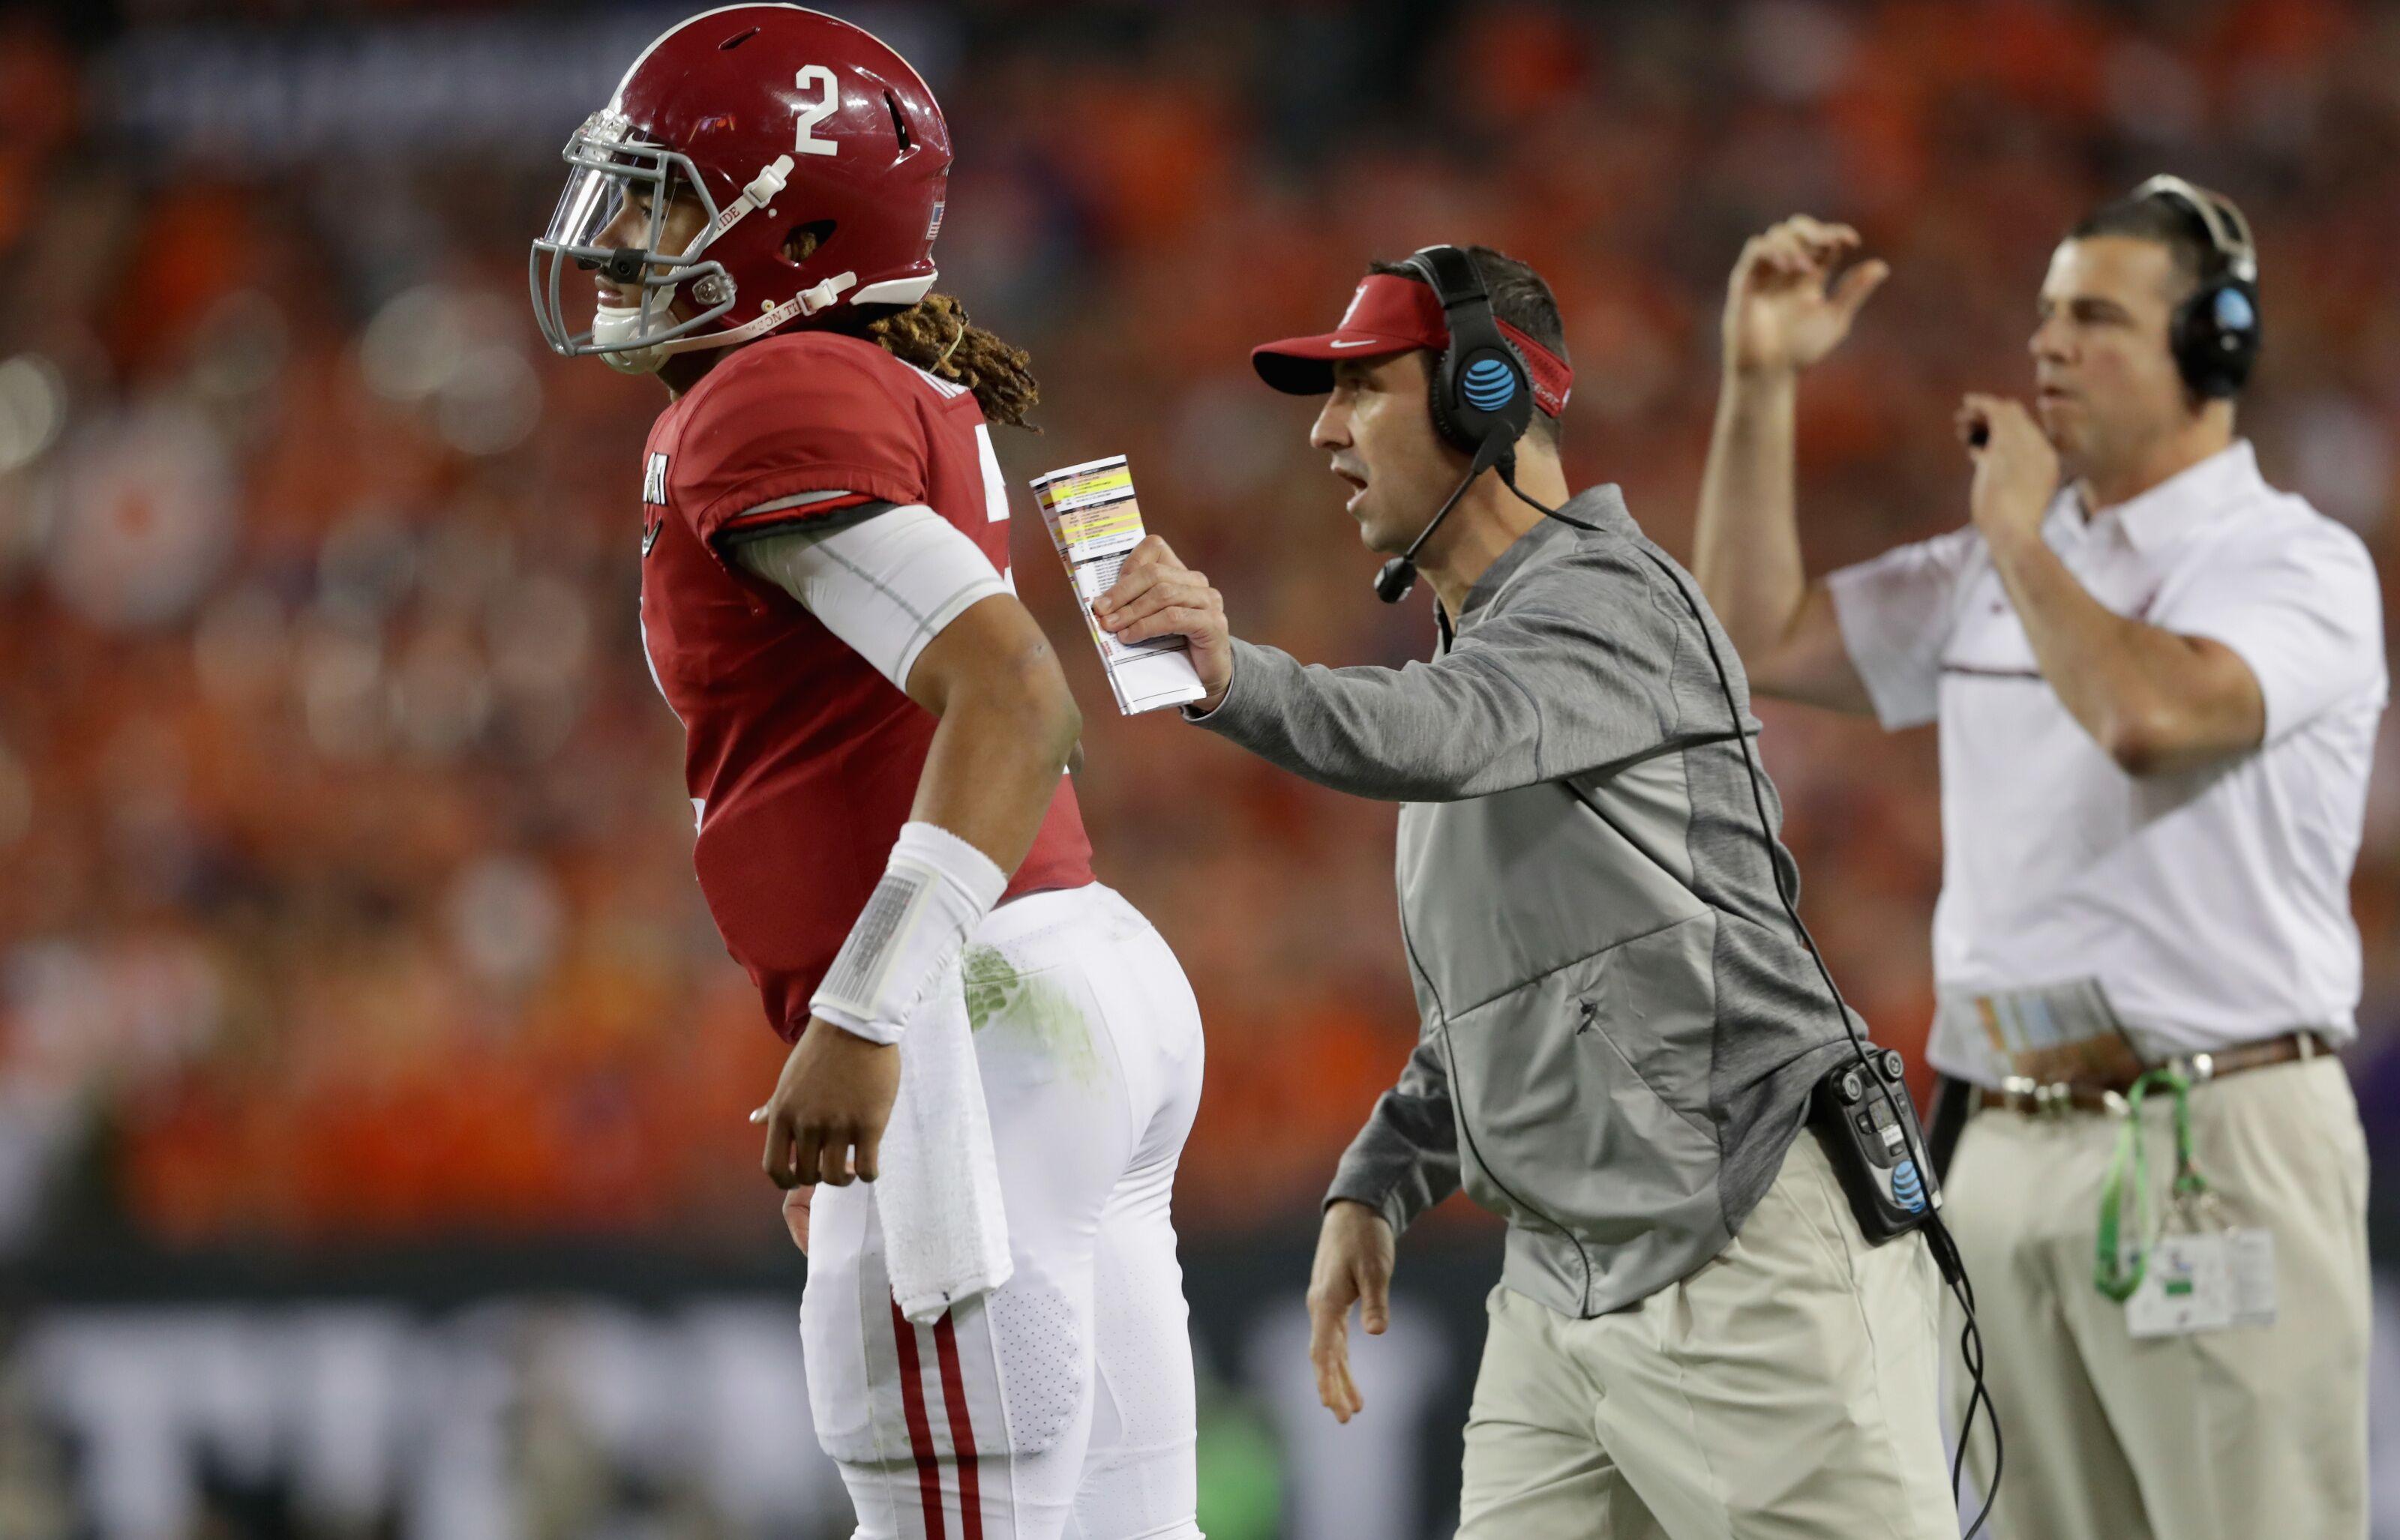 Alabama Football: Sarkisian return step in right direction for Nick Saban